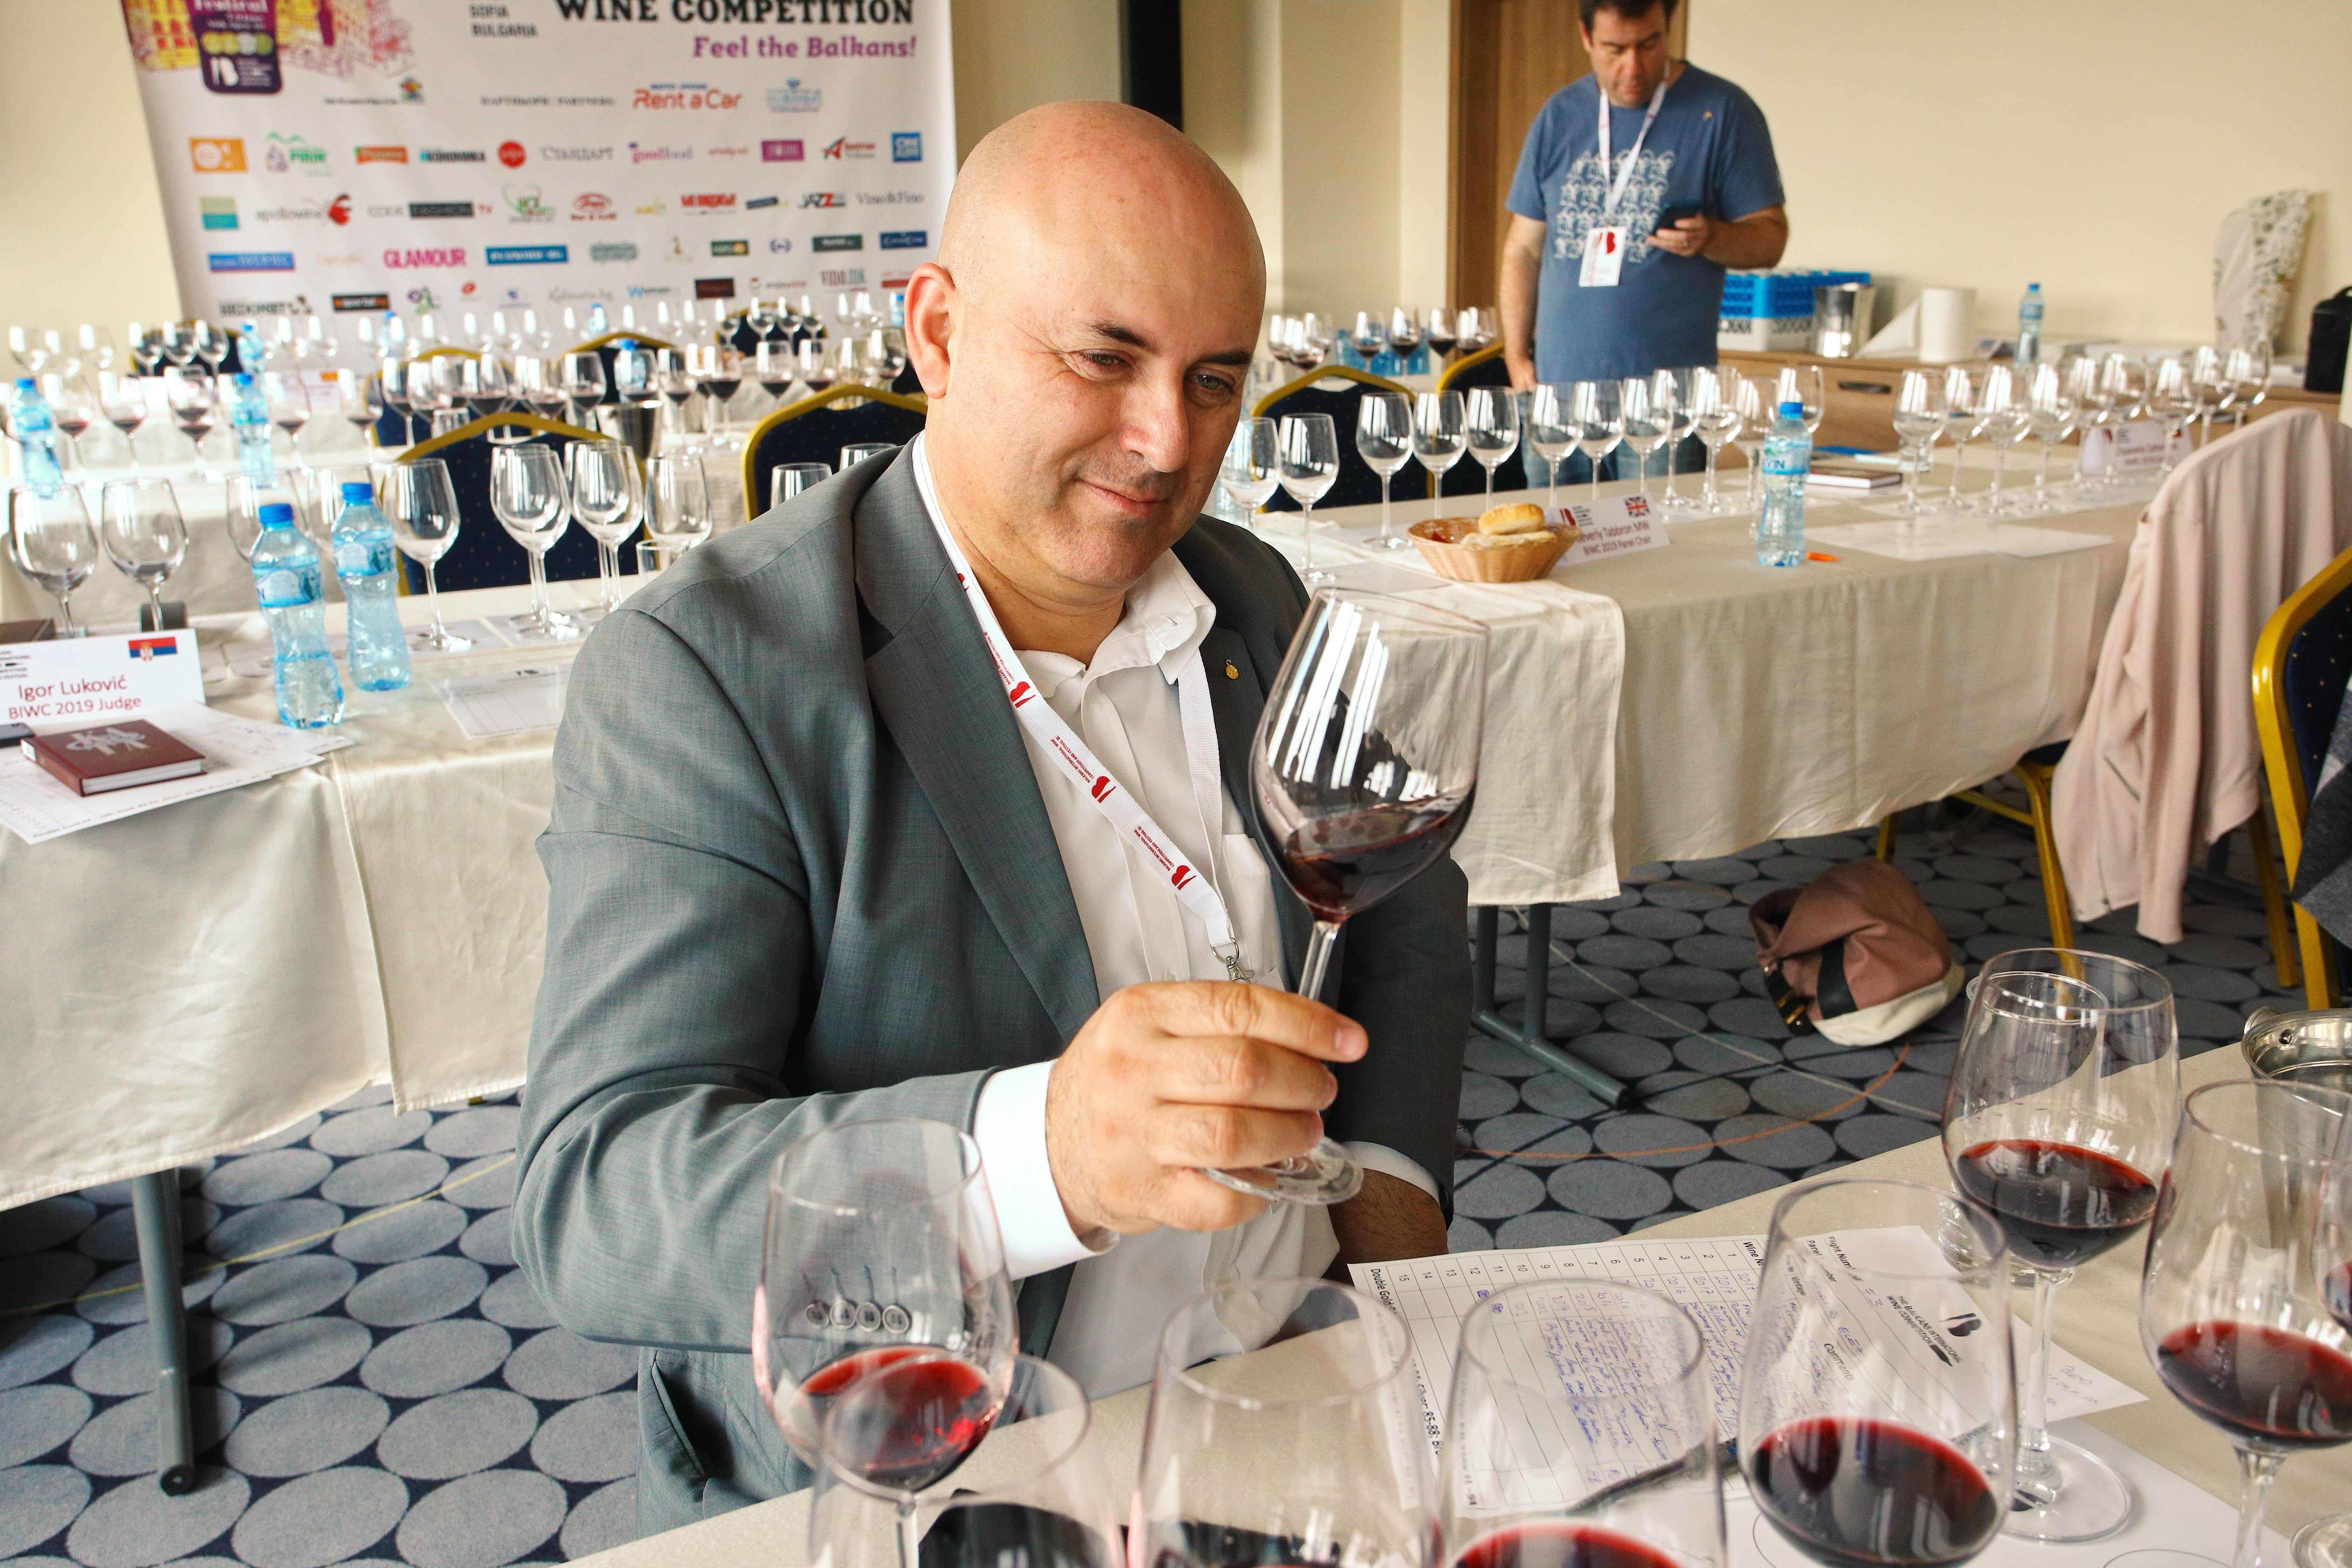 Balkans international wine competition